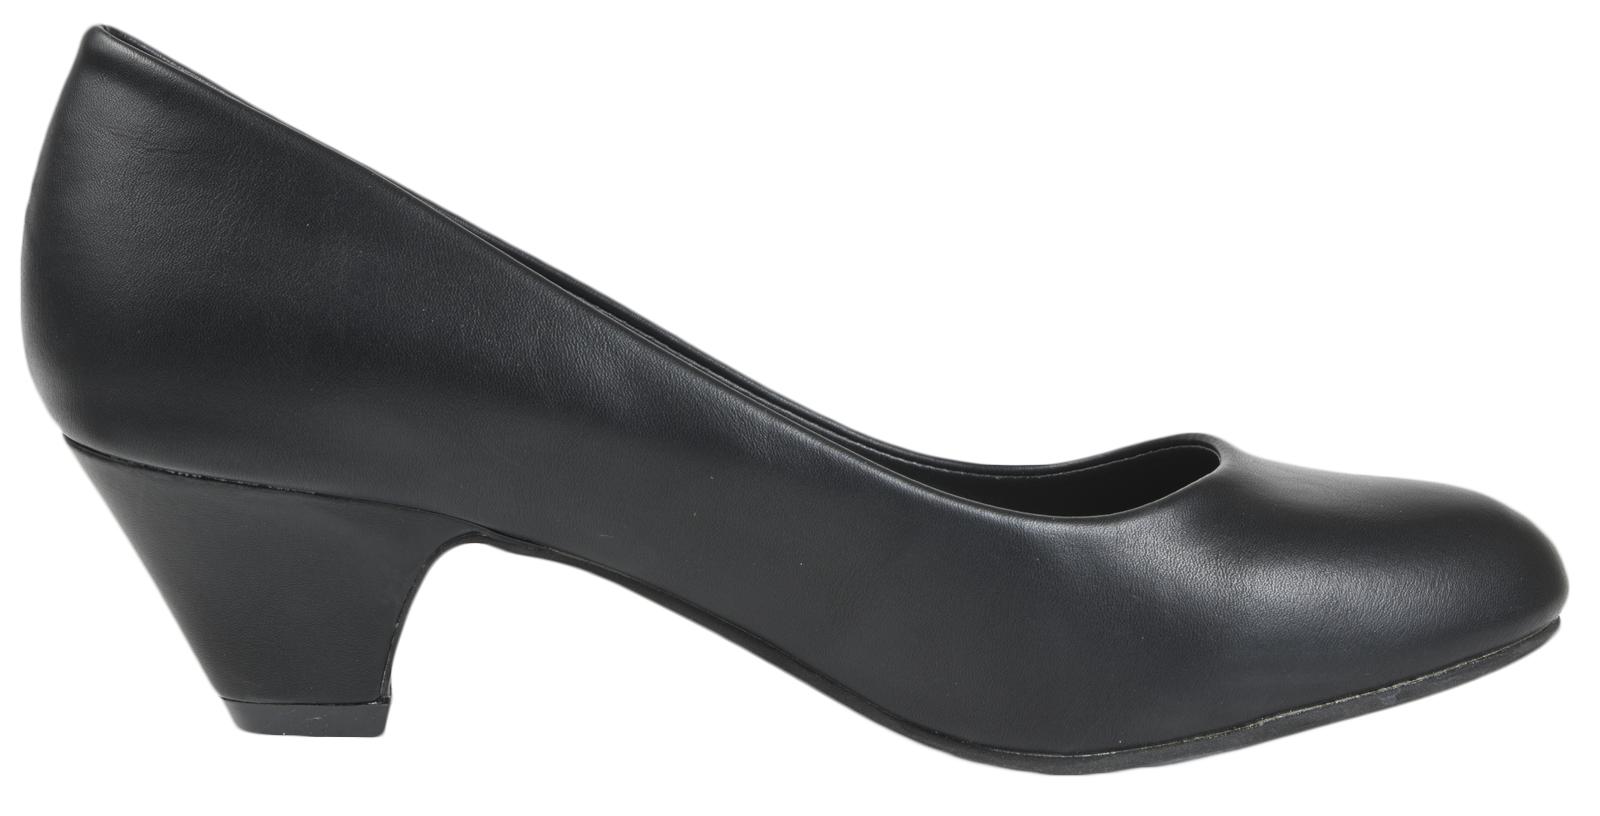 b96691da14a Womens Low Block Heels Comfort Work Office Loafers Smart Court Shoes ...